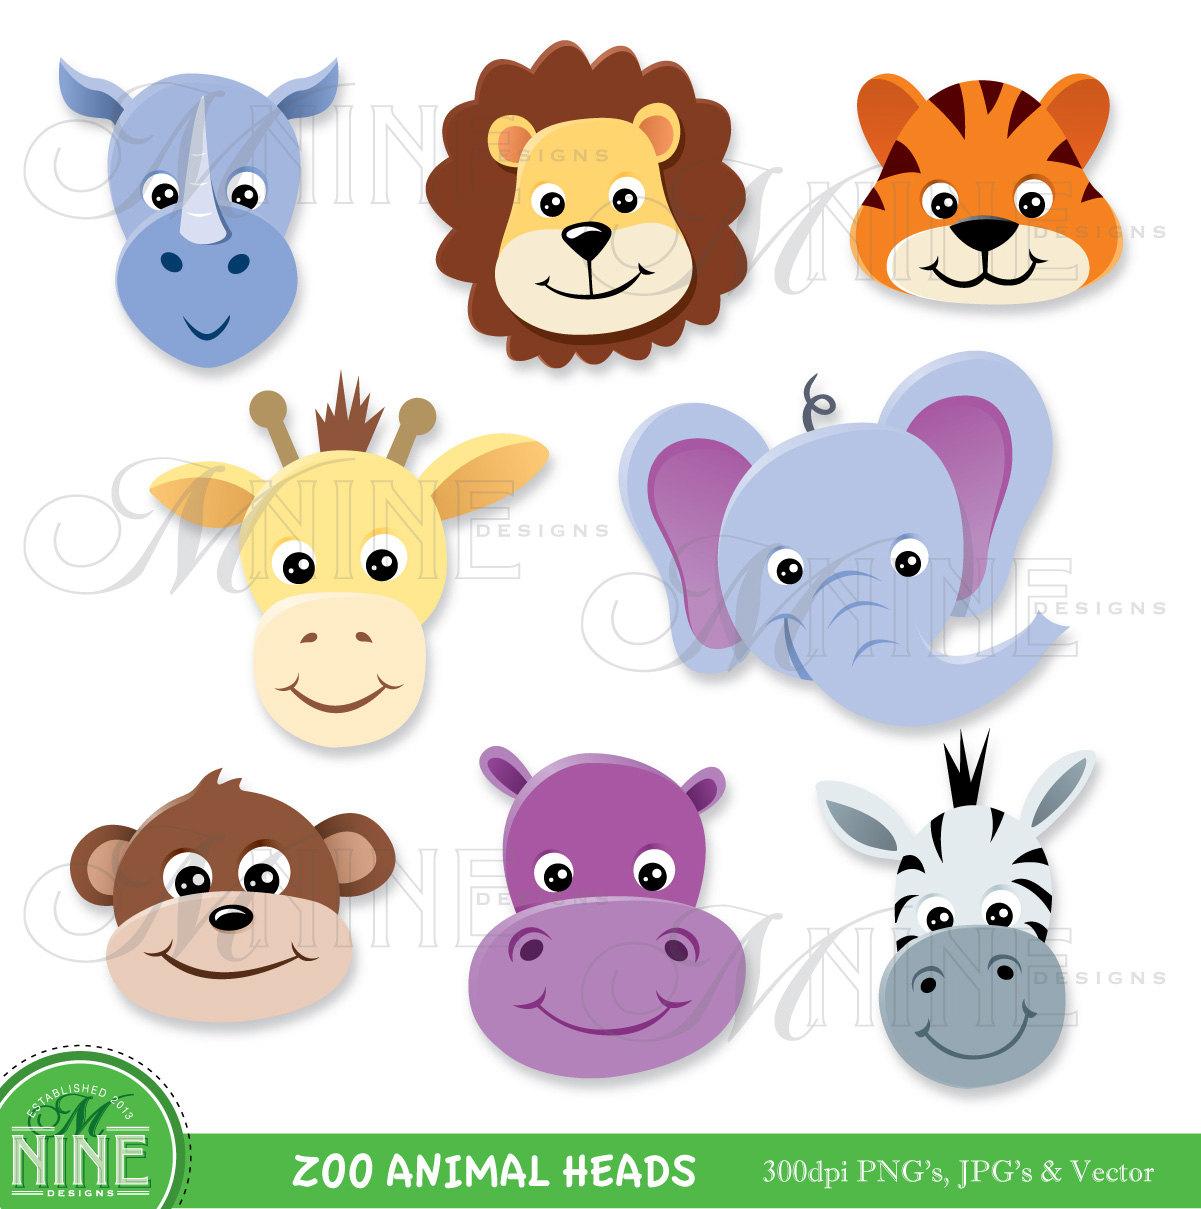 ZOO ANIMAL HEADS Clipart .